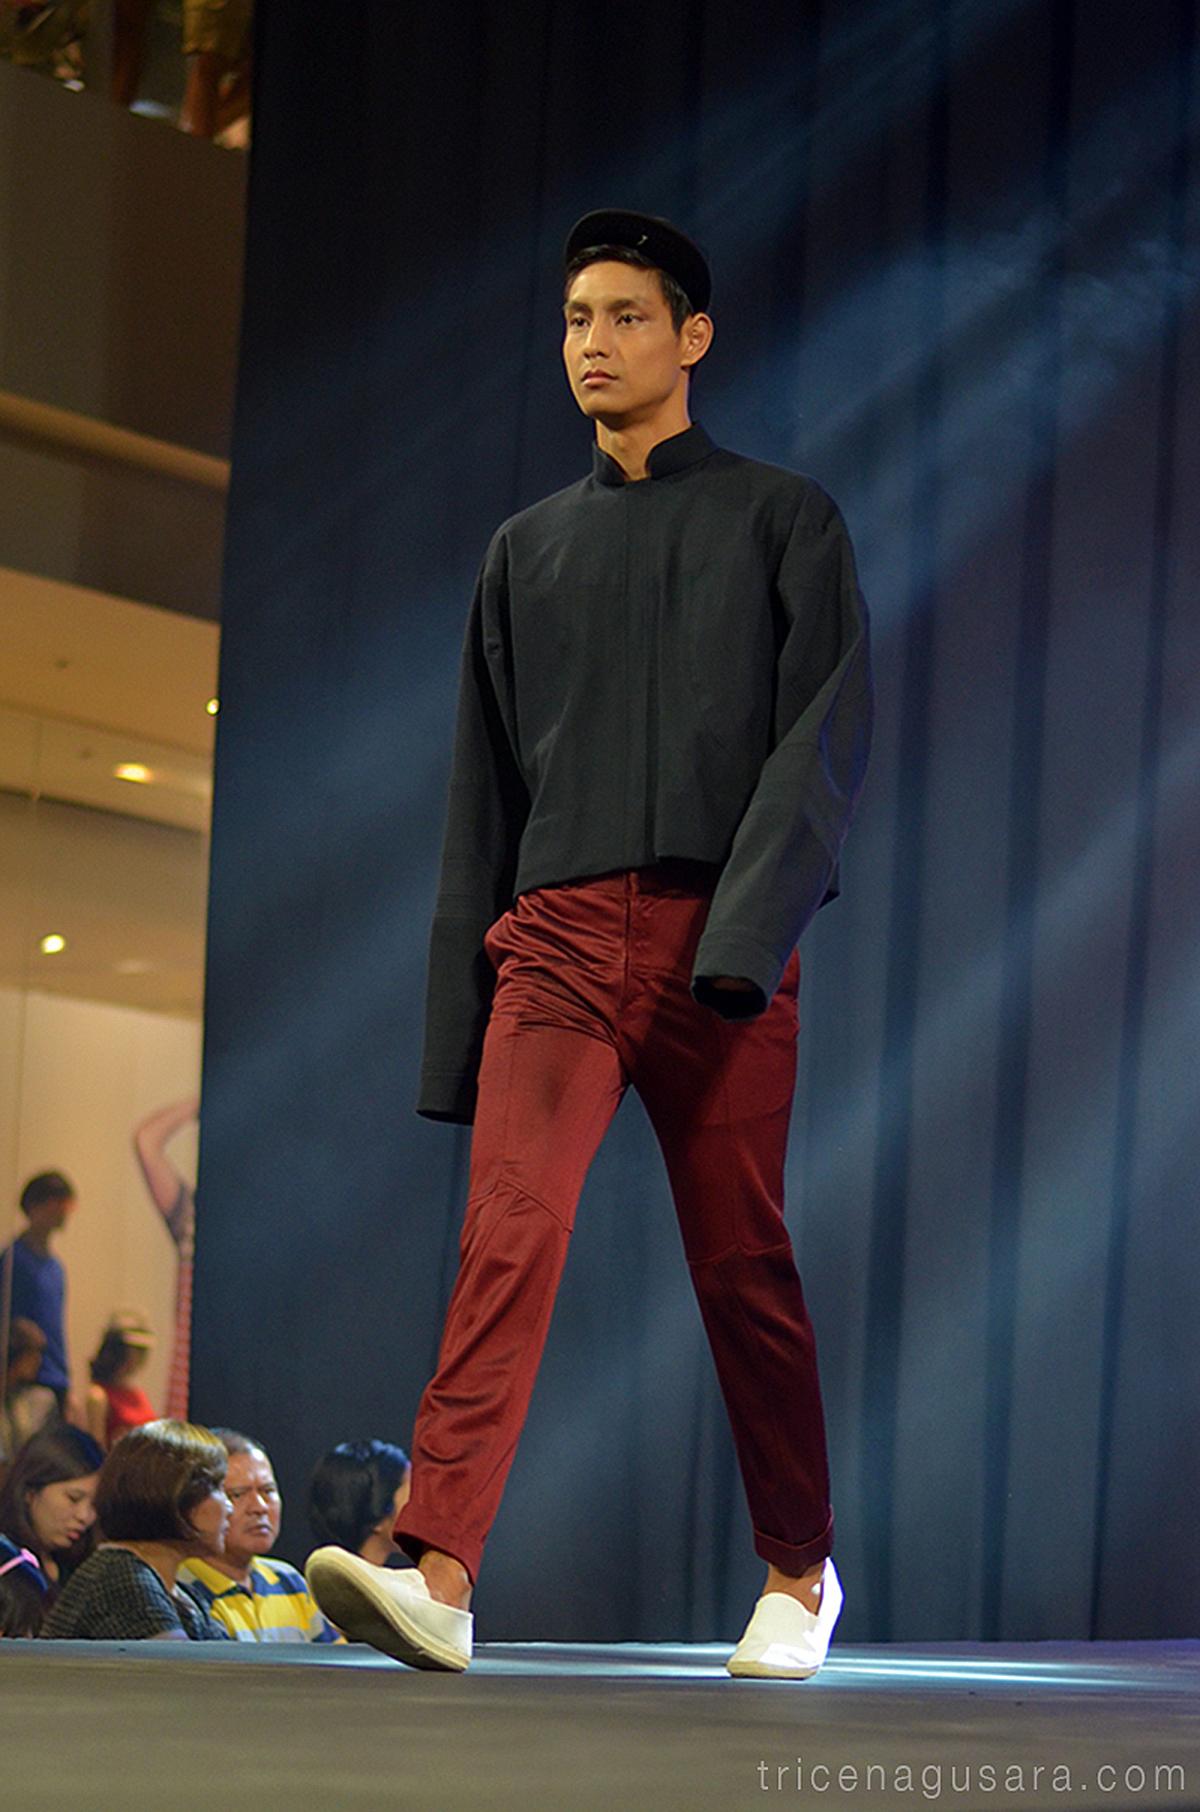 Trice Nagusara La Petite Style Origin 5